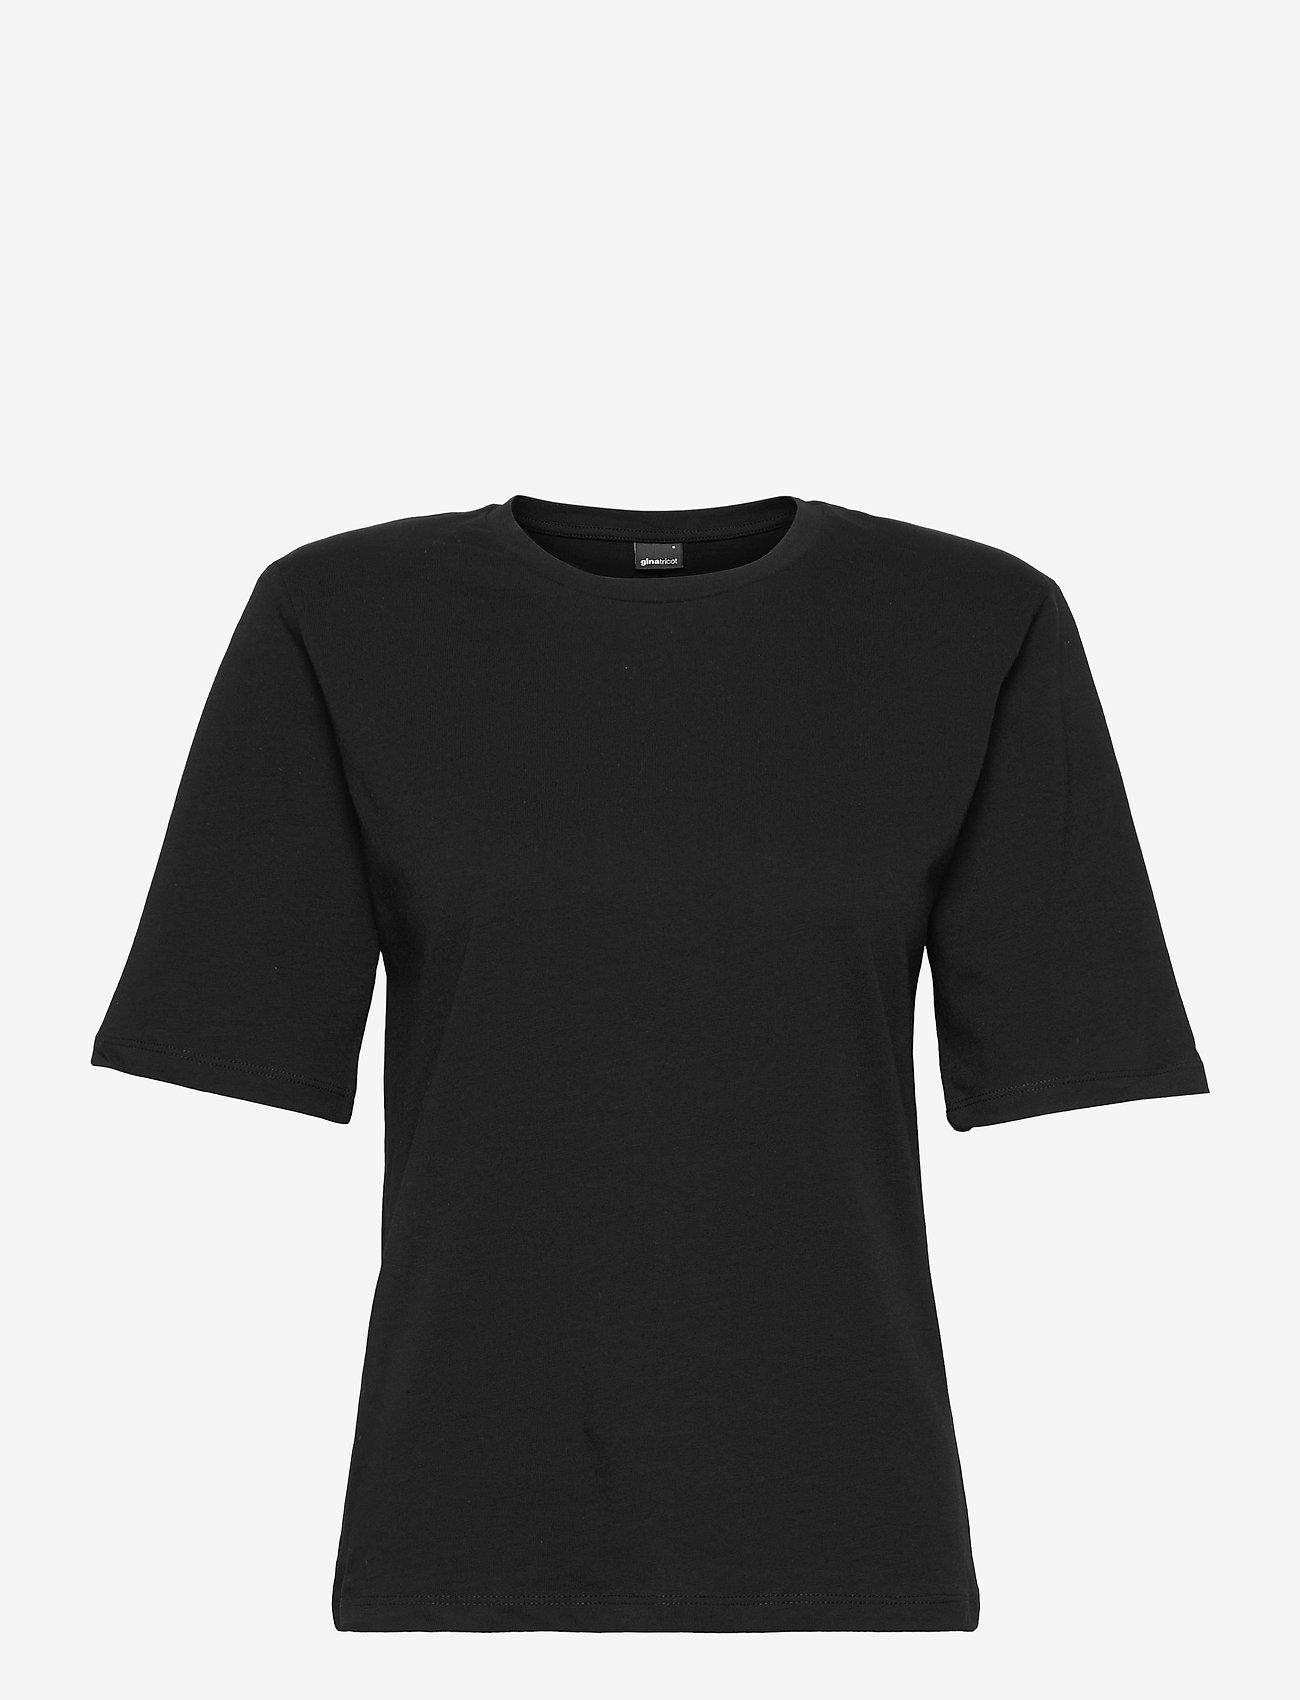 Gina Tricot - Tara tee - t-shirts - black (9000) - 0